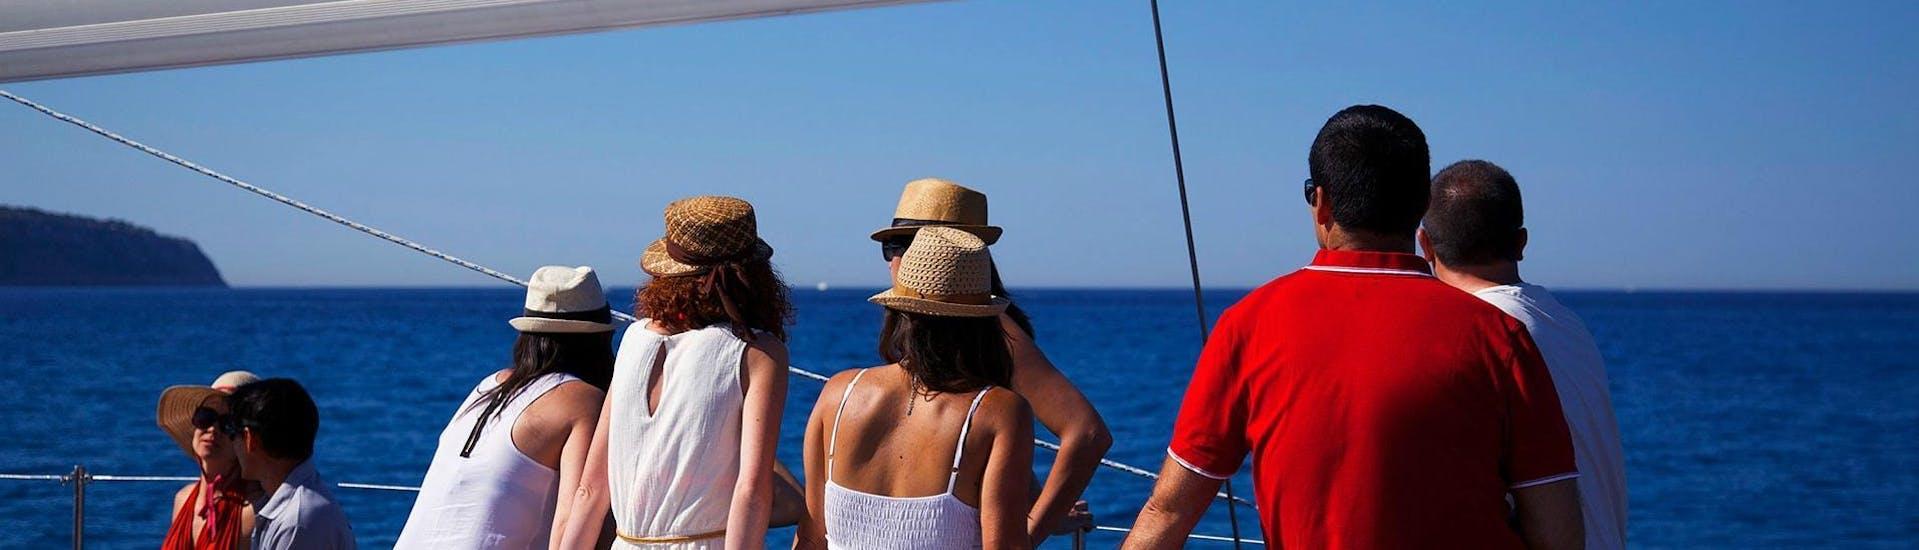 private-boat-tour-1-2-high-season-palma-de-mallorca-oasis-catamaran-hero